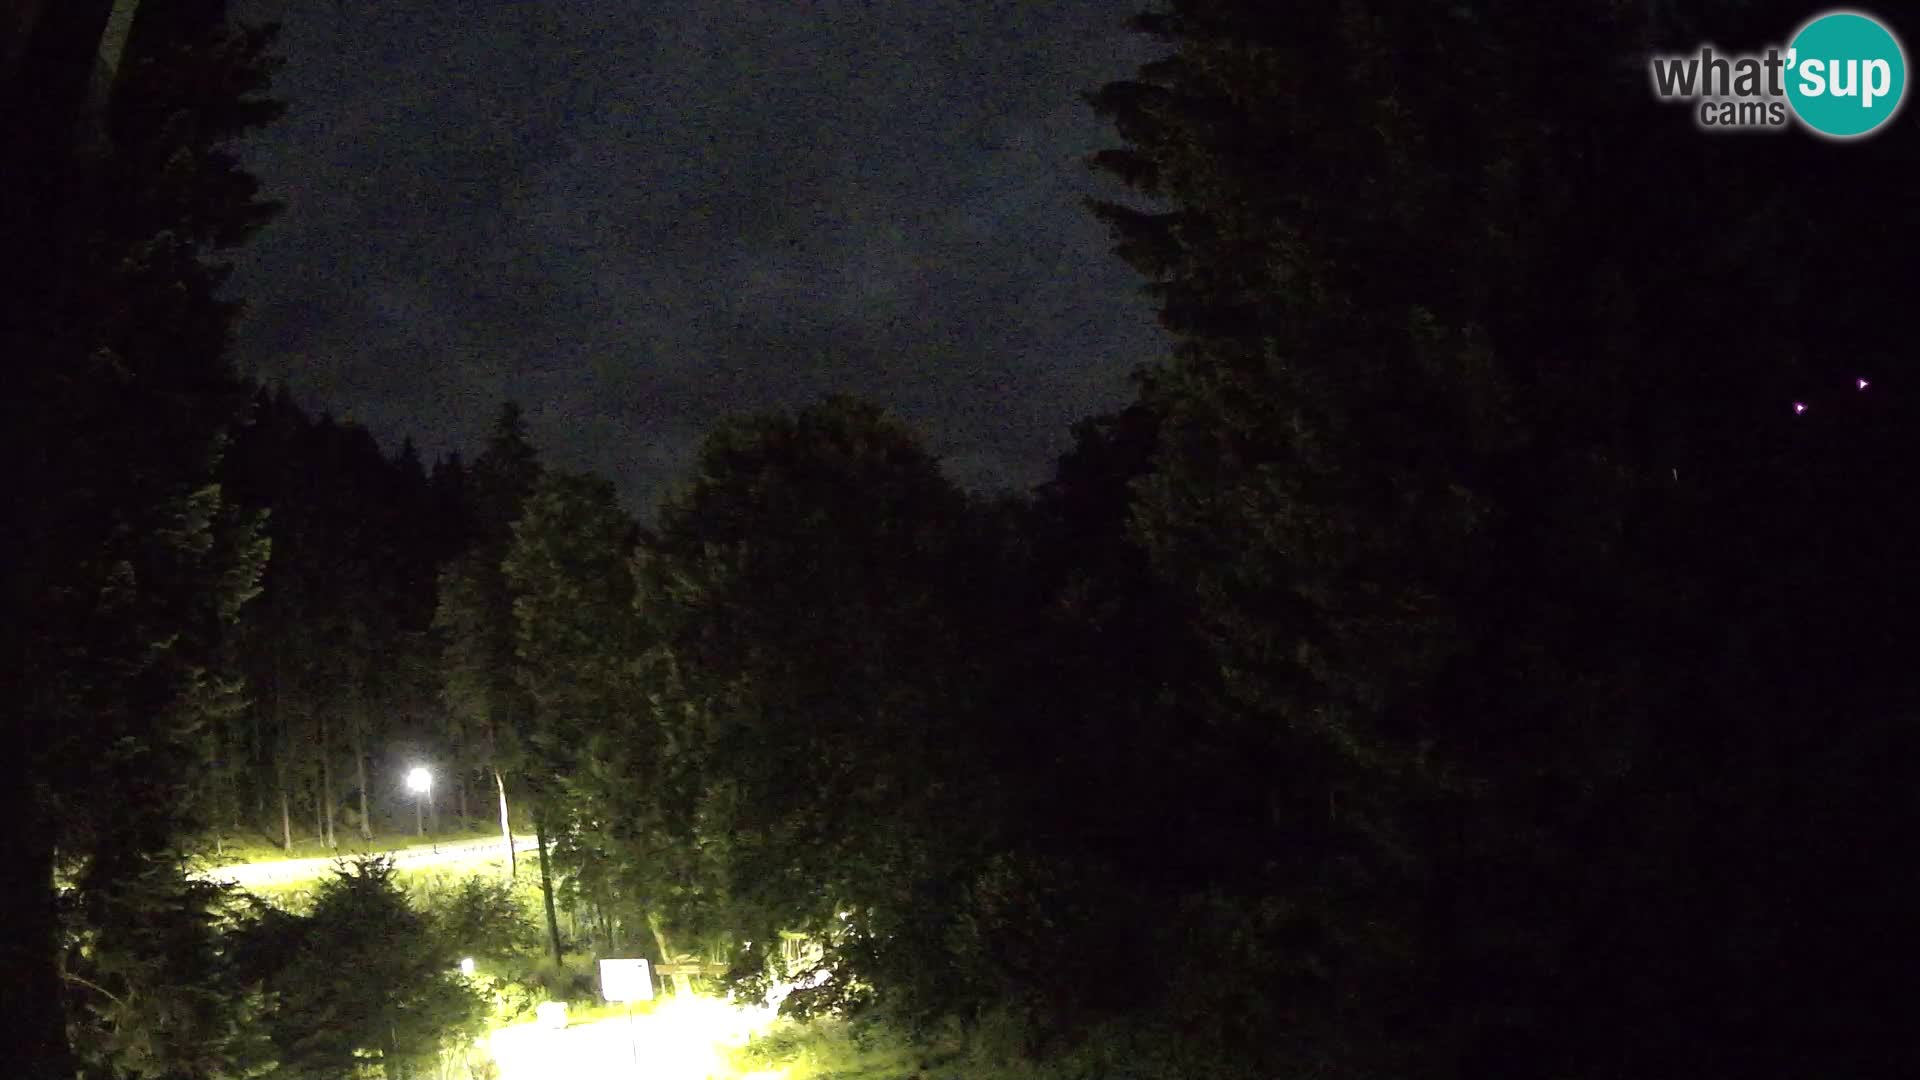 LIVE cam Spalona – Station de ski de fond Spalona webcam Montagnes Bystrzyckie